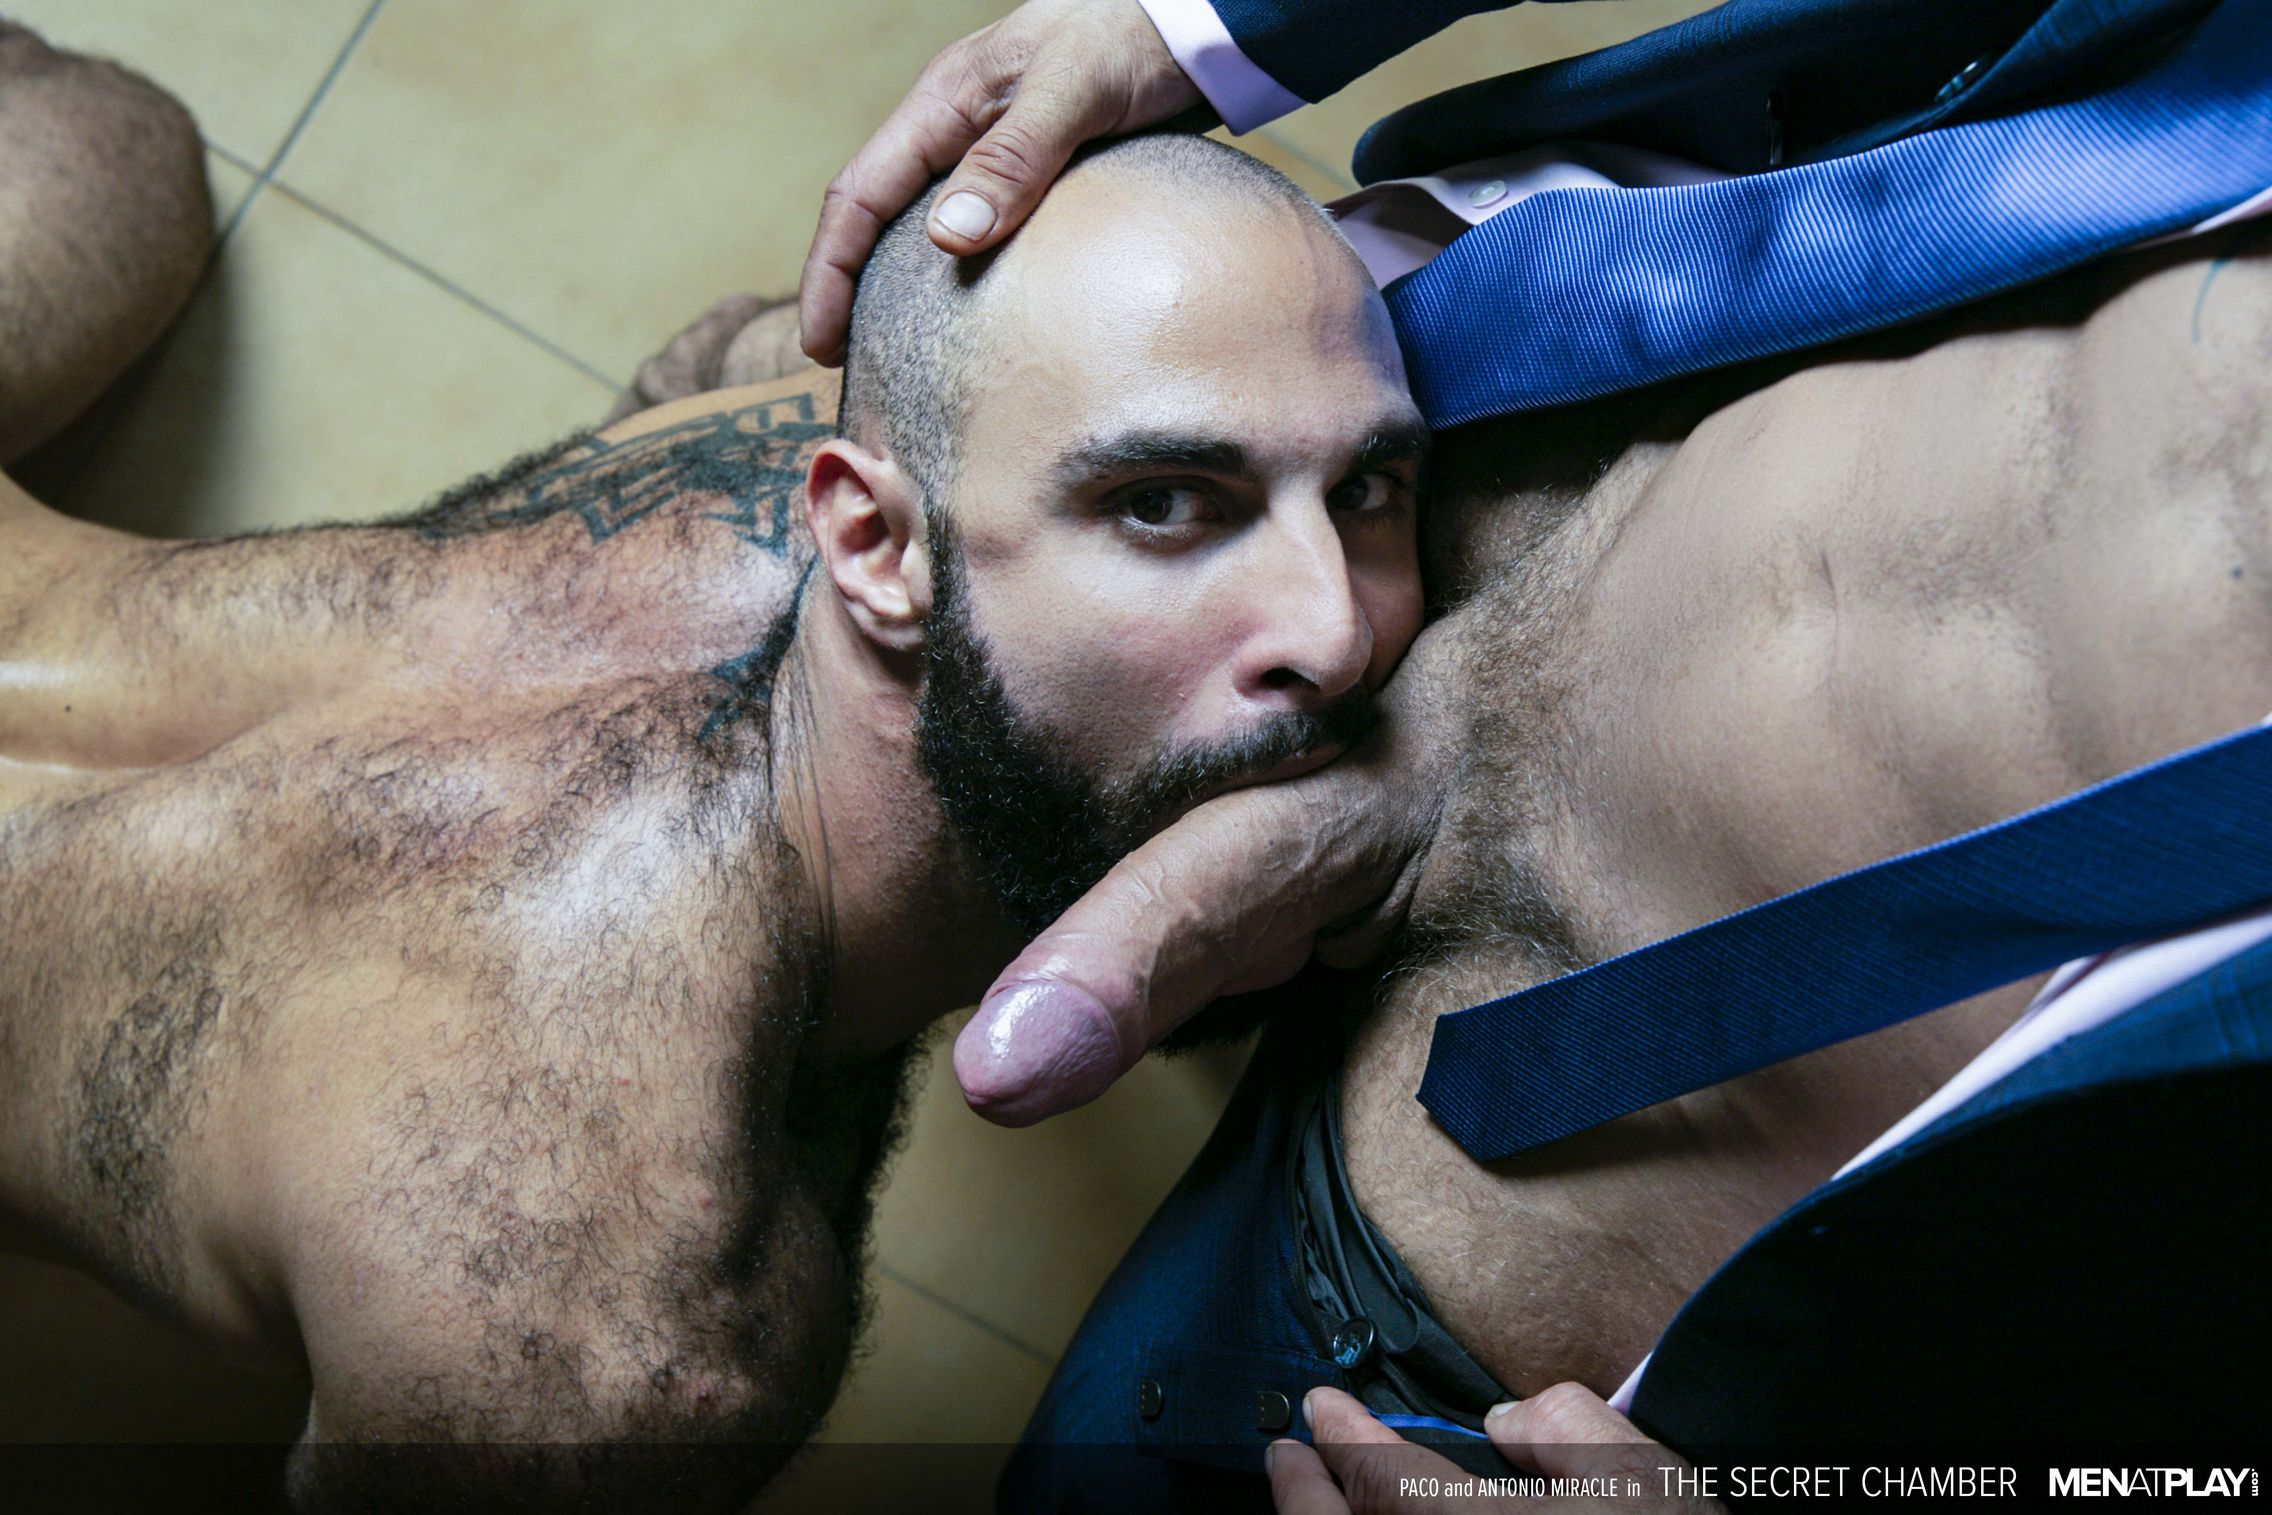 Antonio Miracle fuck Paco gay hot daddy dude men porn Secret Chamber